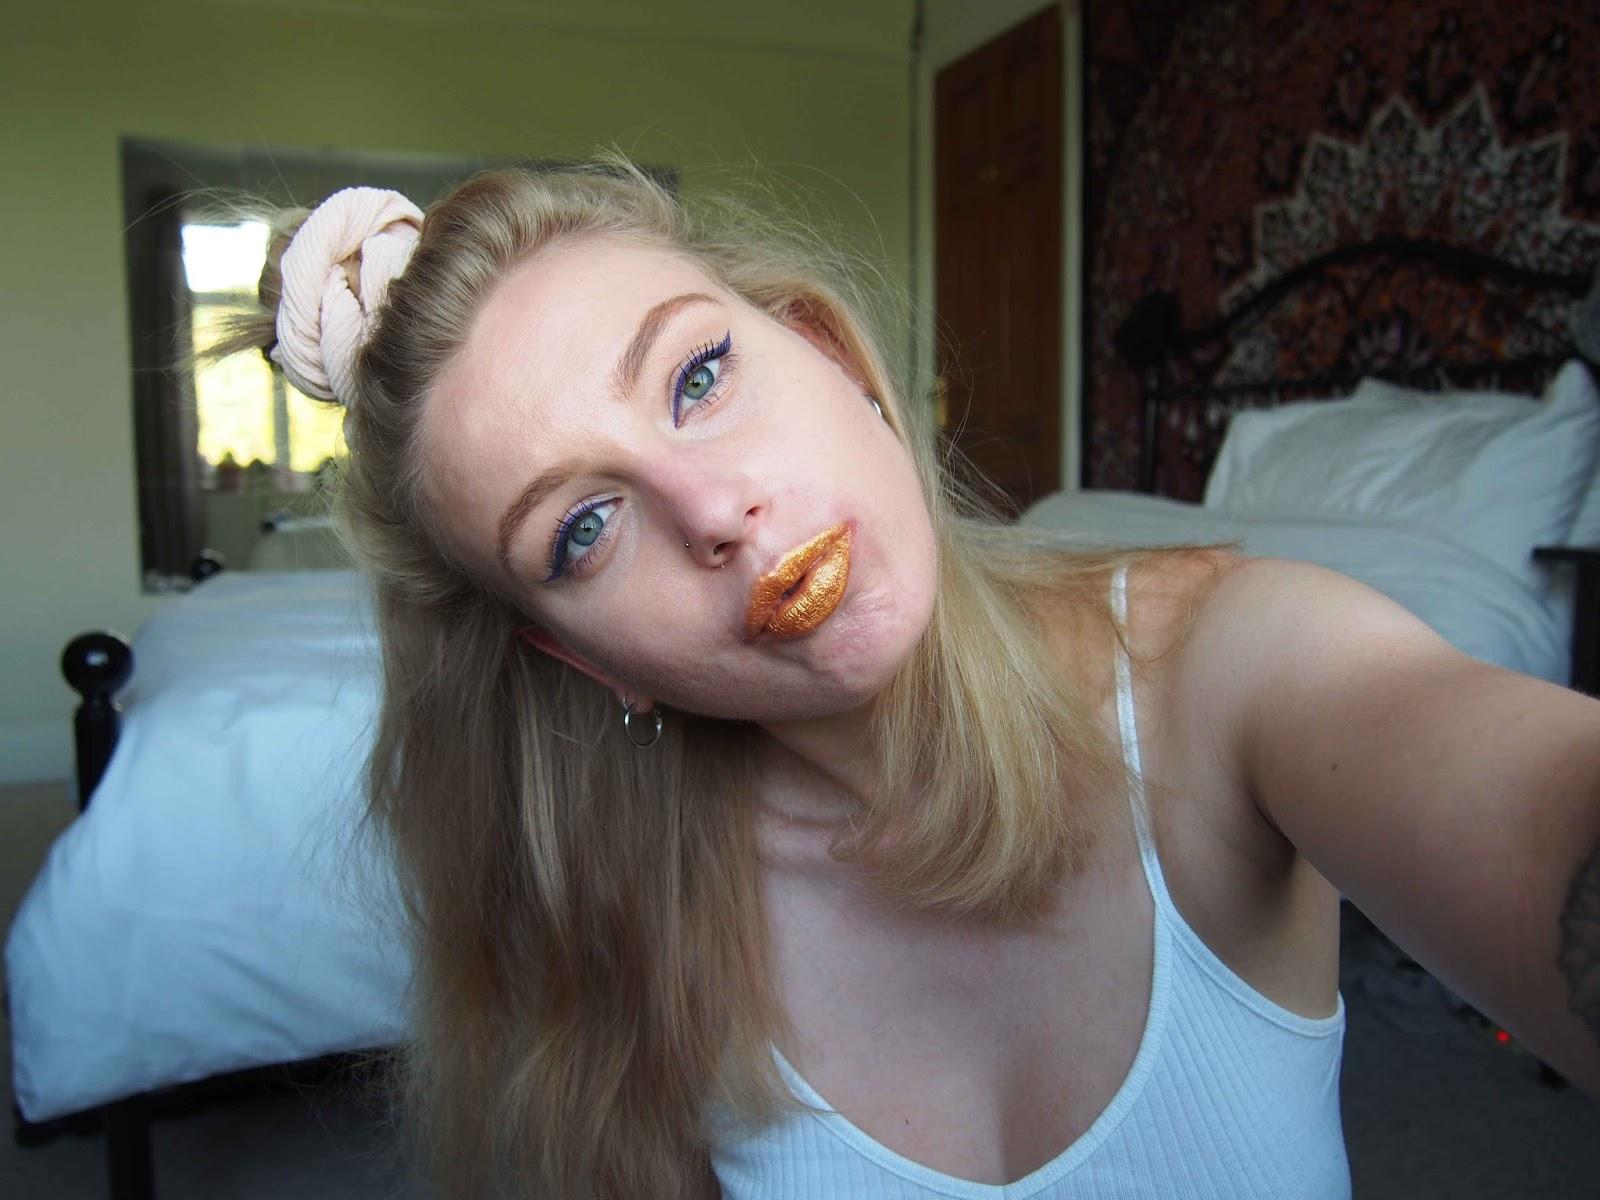 gold lipstick, loreal gold obsession riche lipstick pure gold, gold lipstick, lilac purple eyeliner, colourful makeup, subtle festival makeup, grunge makeup and hair, nyx vivid brights vivid violet 1